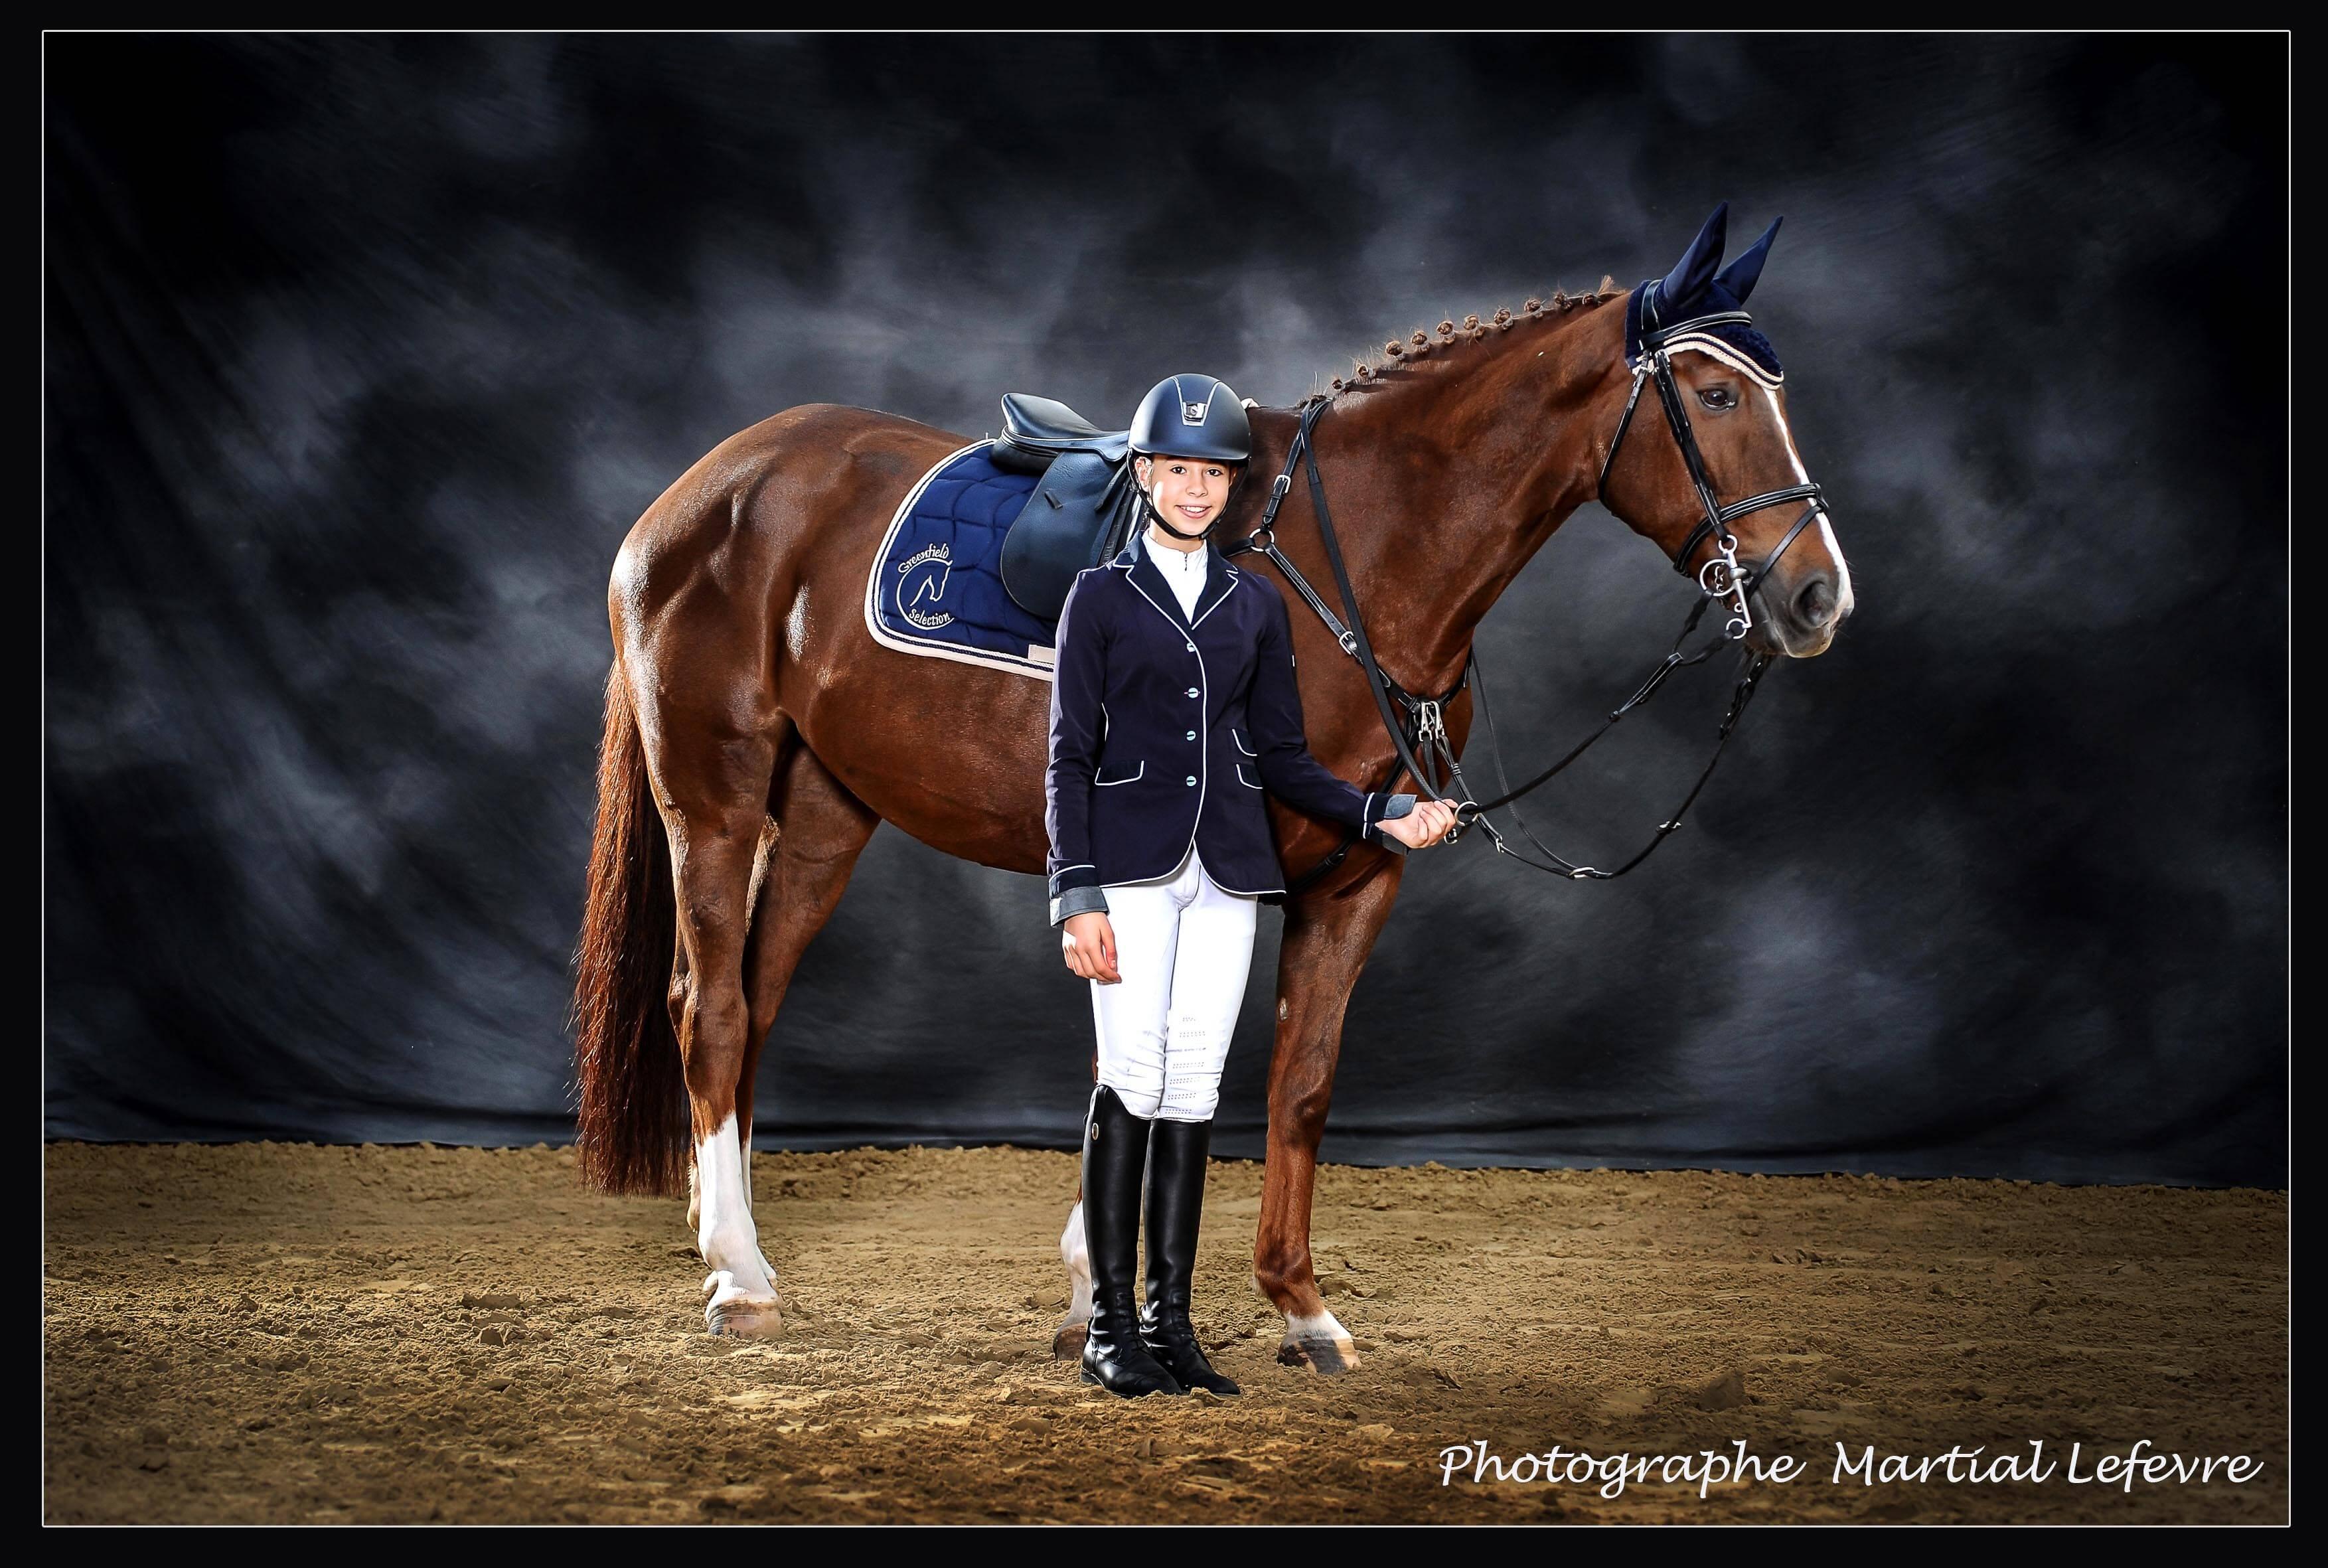 photographe chevaux martial lefevre. Black Bedroom Furniture Sets. Home Design Ideas